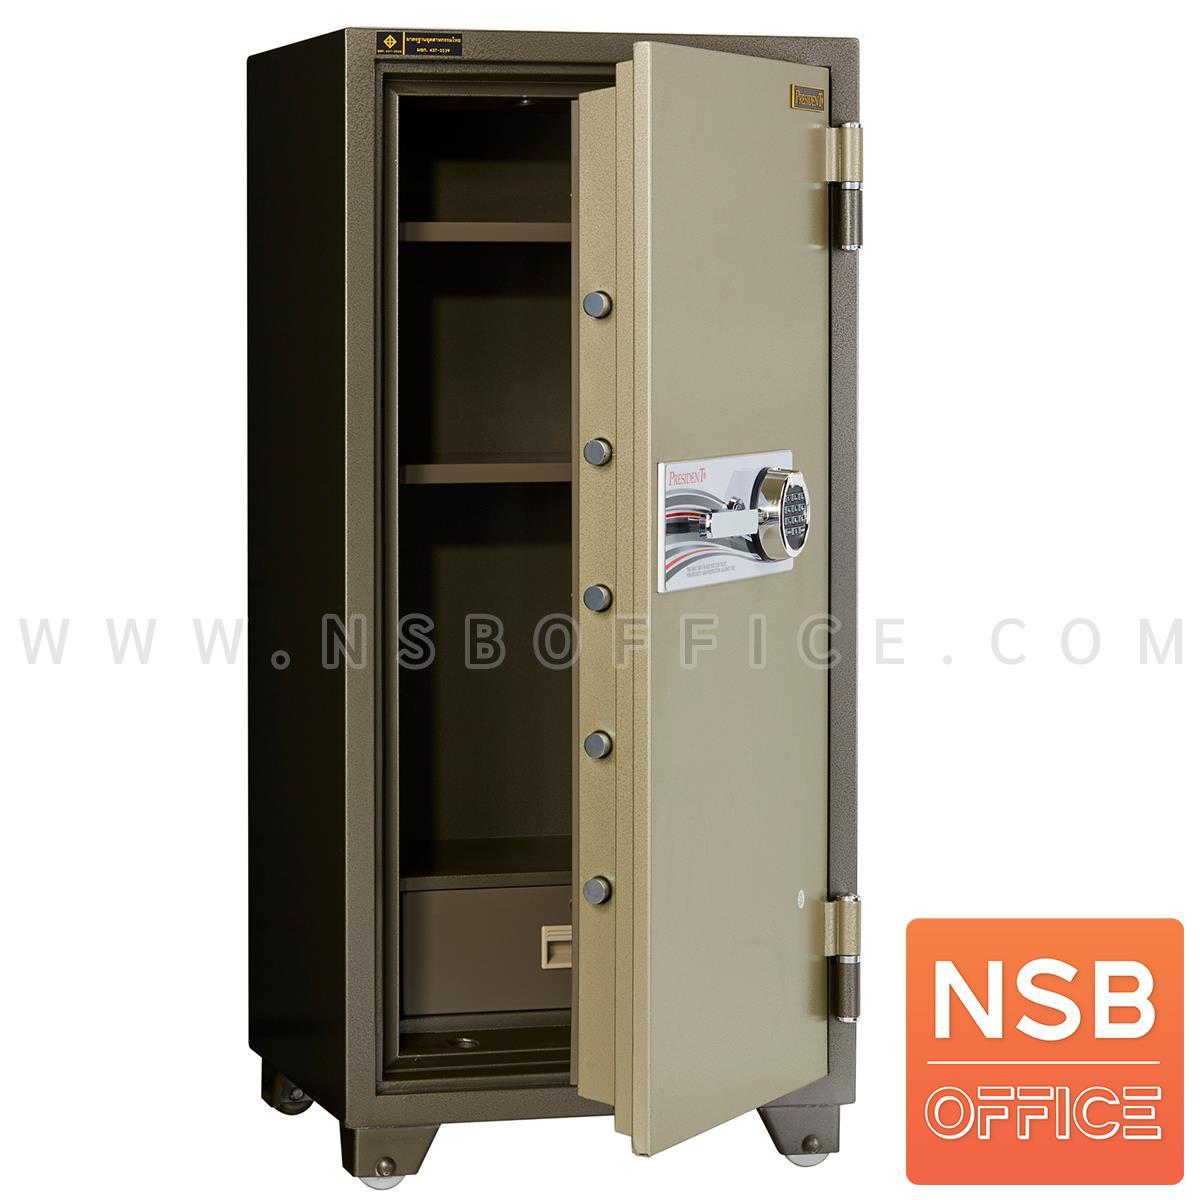 F05A083:ตู้เซฟนิรภัยดิจิตอลระบบสแกนนิ้วมือ 250 กก.  รุ่น PRESIDENT-SB50DF 1 กุญแจ 1 รหัส